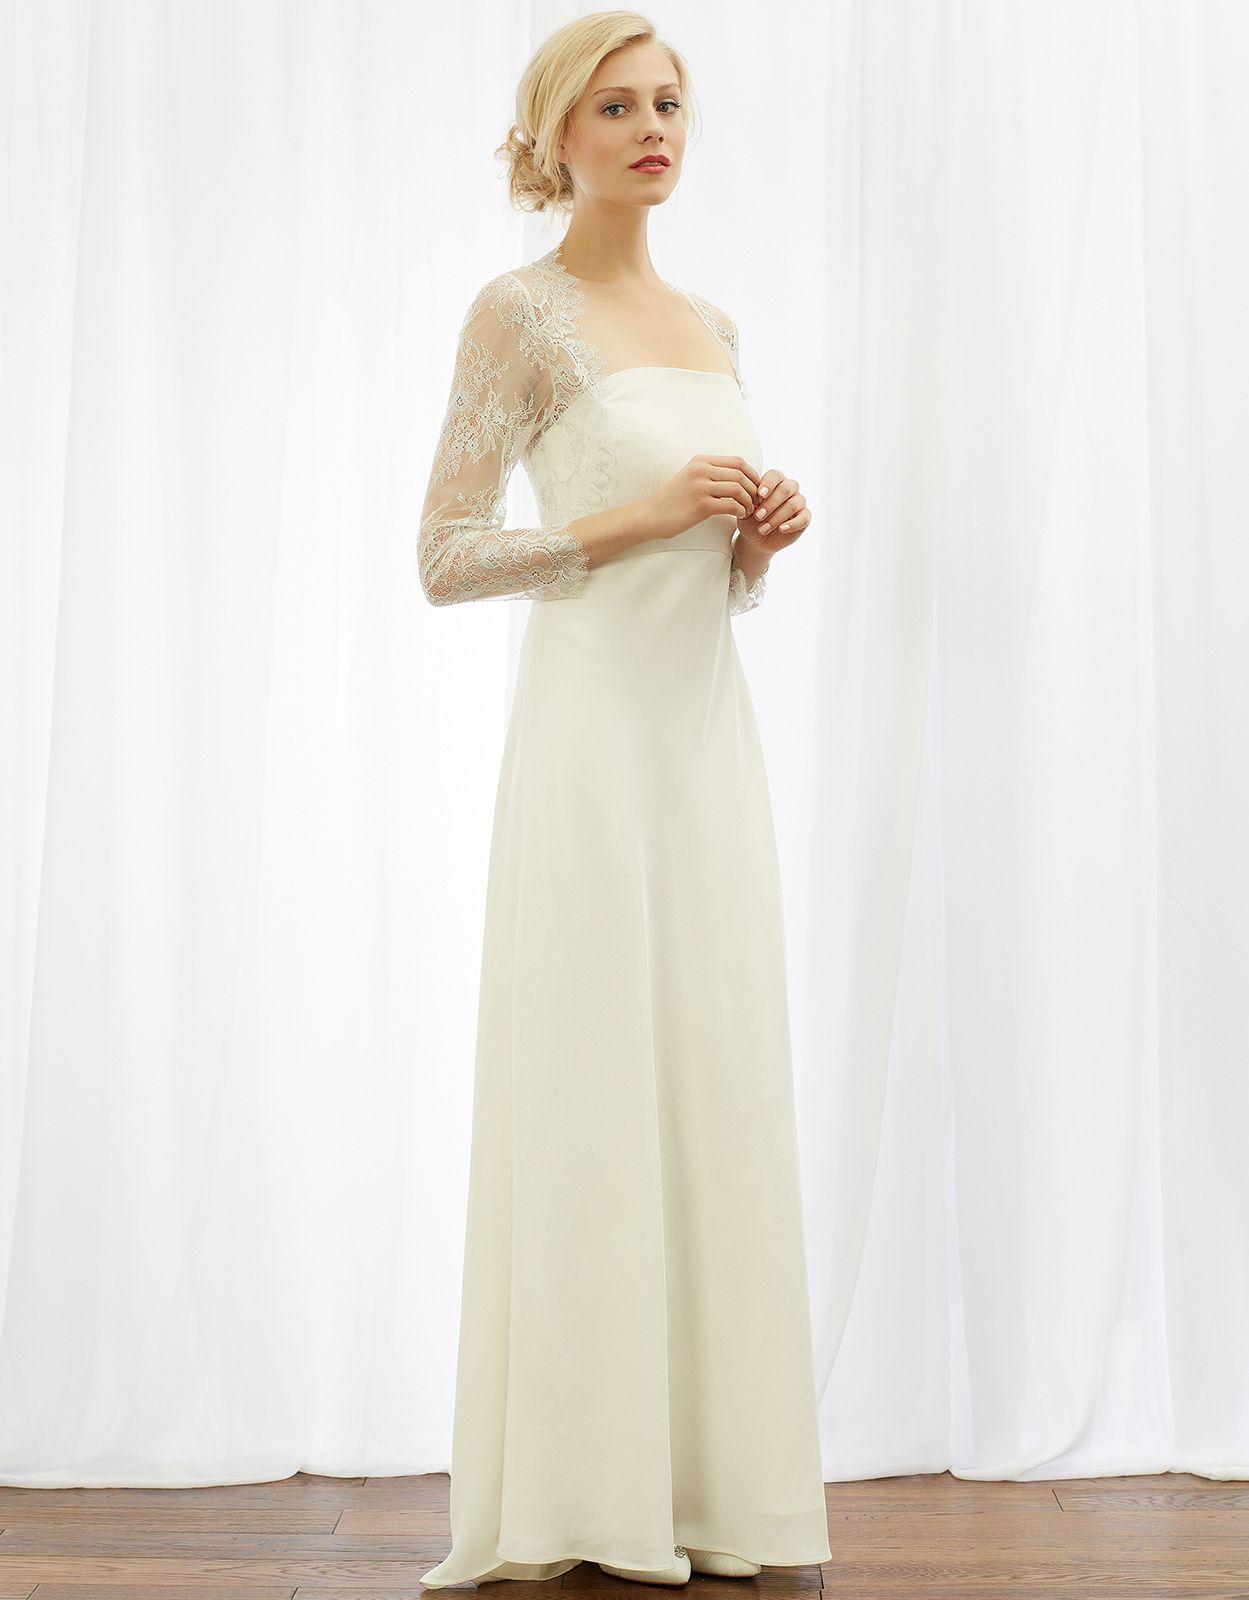 Alternative, budget wedding dresses from the high street